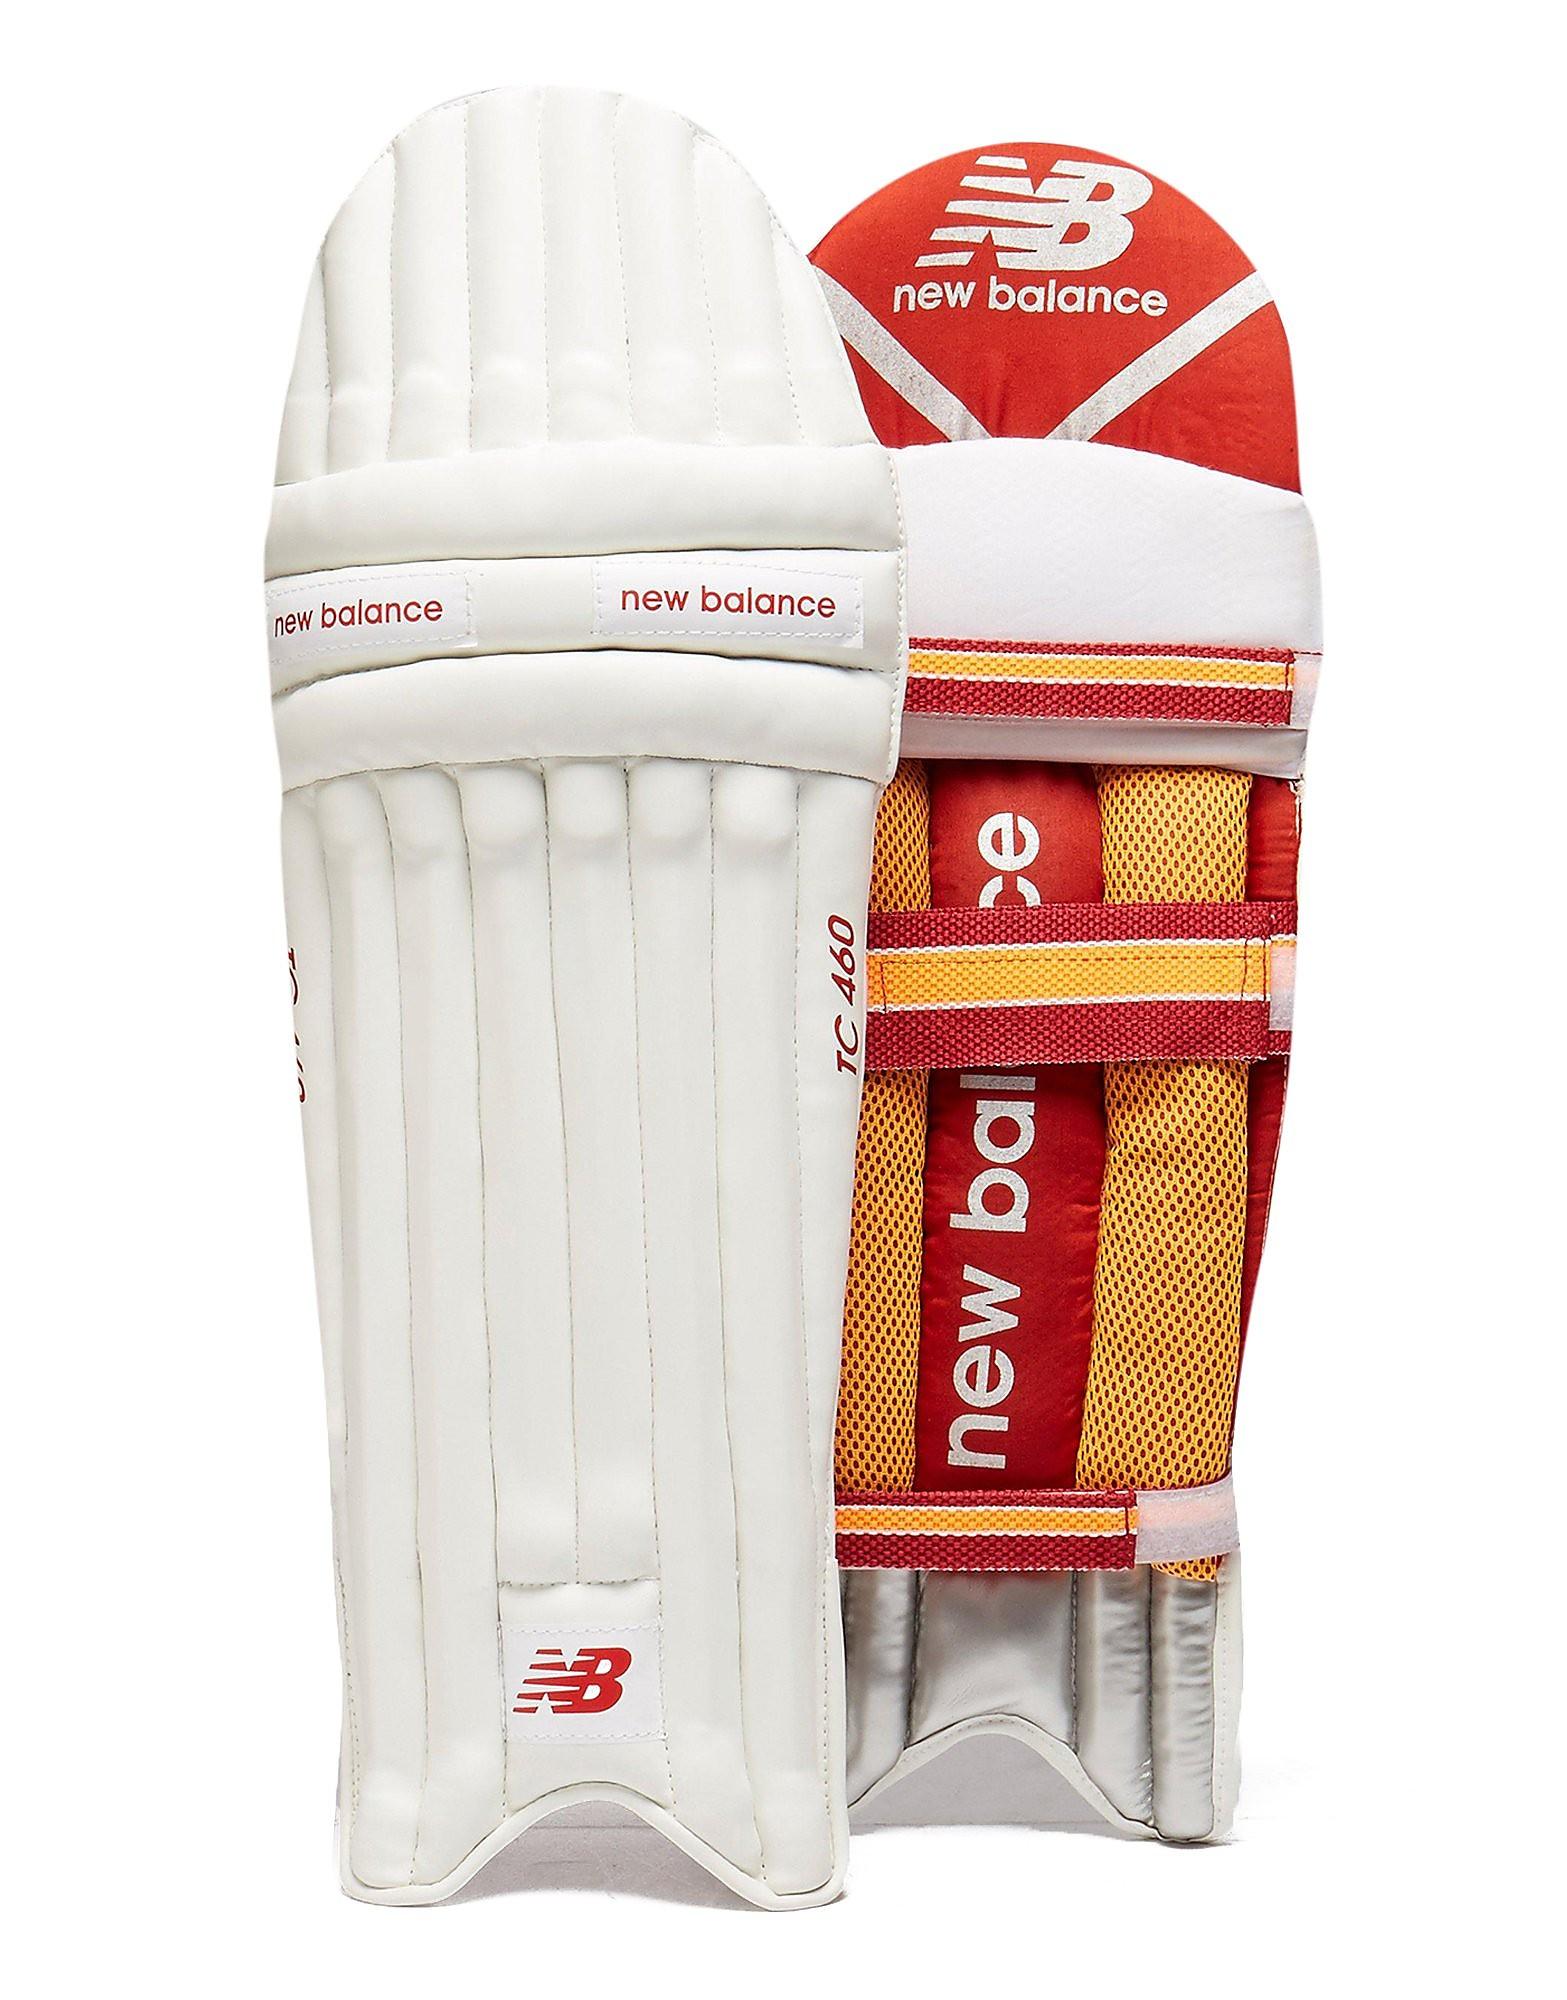 New Balance TC460 Cricket Batting Pads Junior